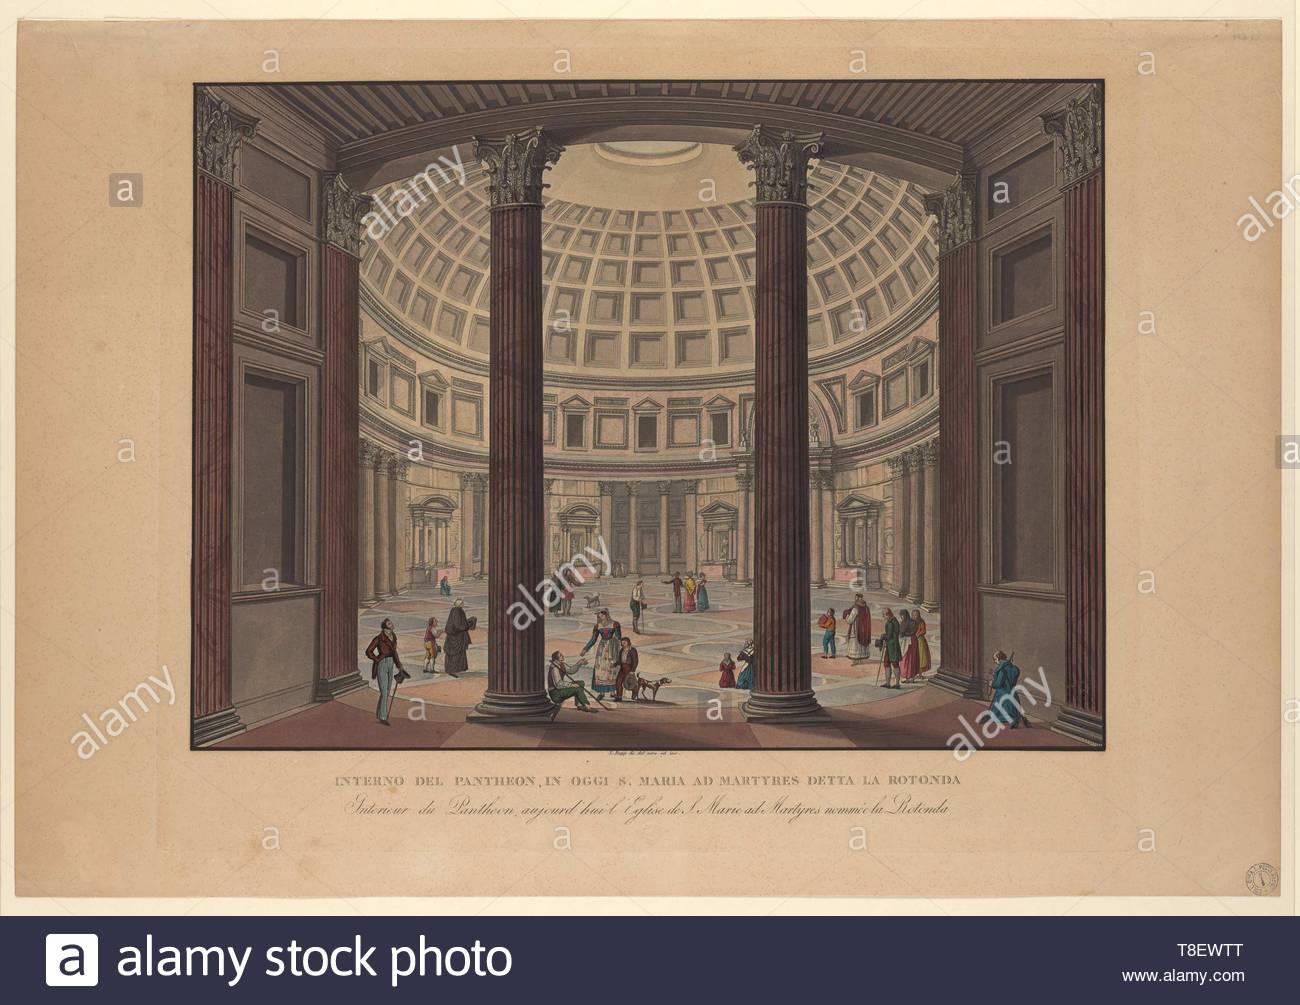 Rupp, Ladislaus, 1793-1854, printmaker.-Interno del Pantheon, in oggi S. Maria ad Martyres della la Rotunda, 1824 - Stock Image